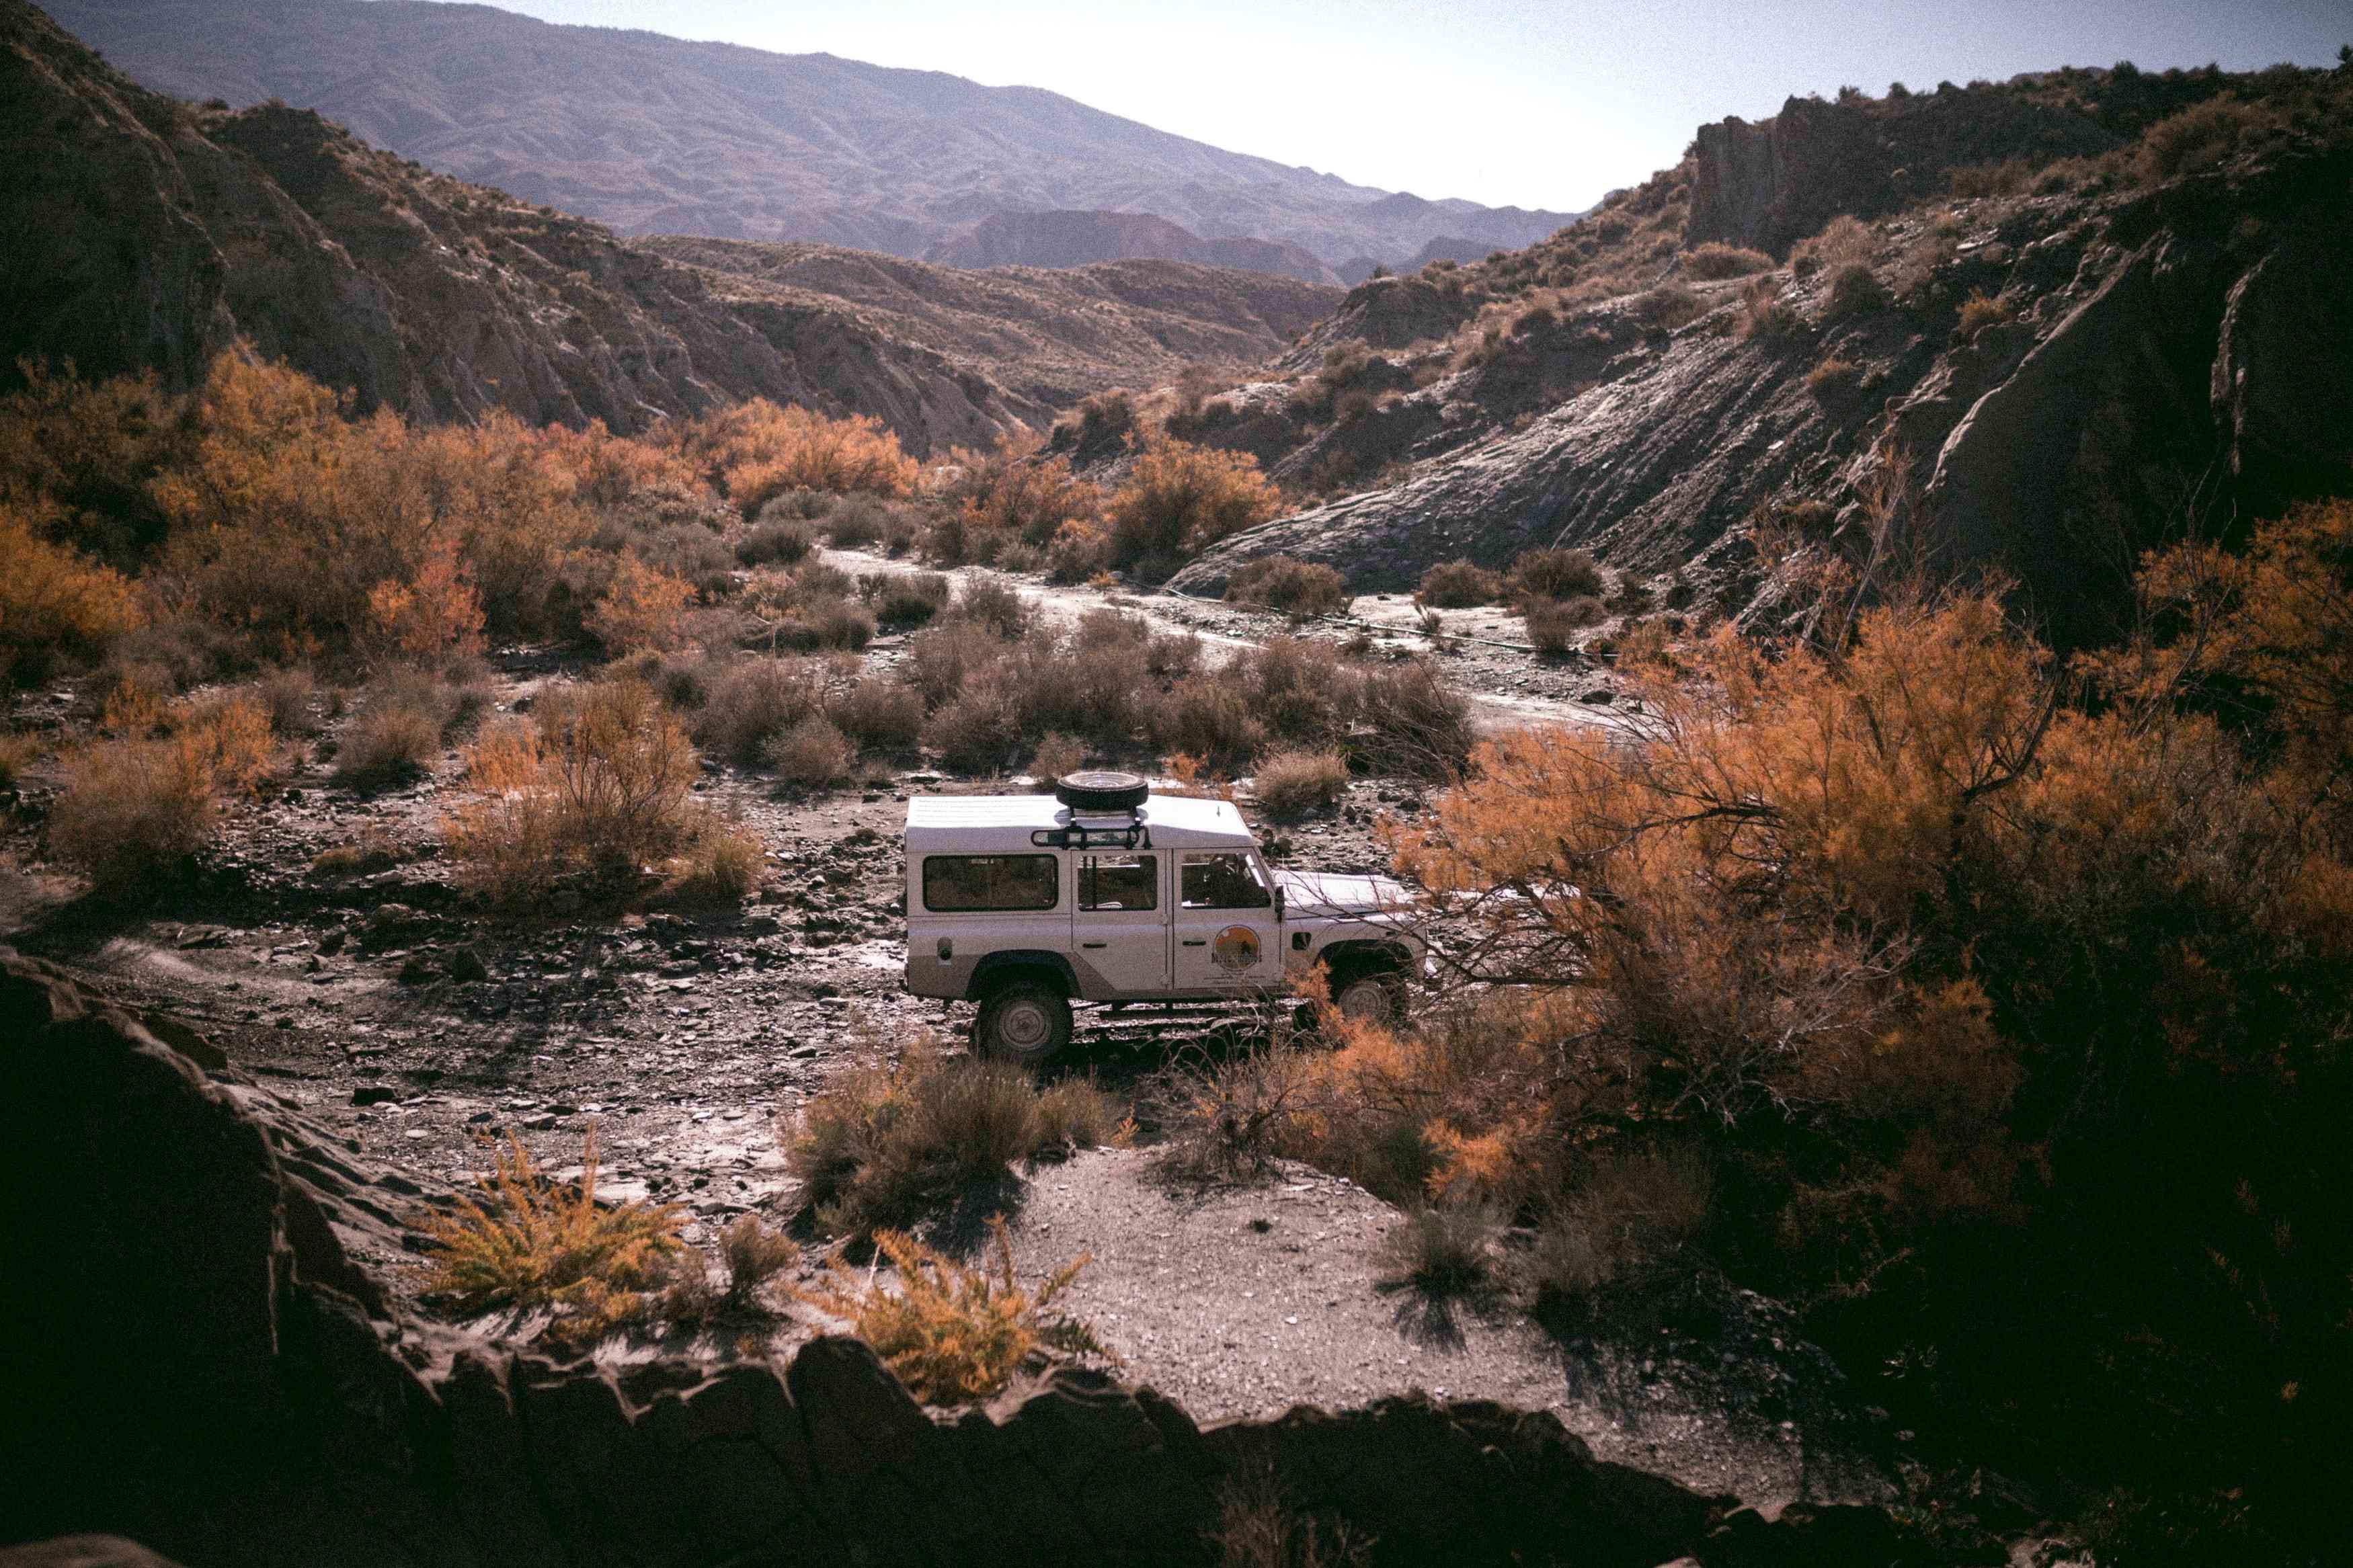 A truck driving through the Tabernas Desert in Spain